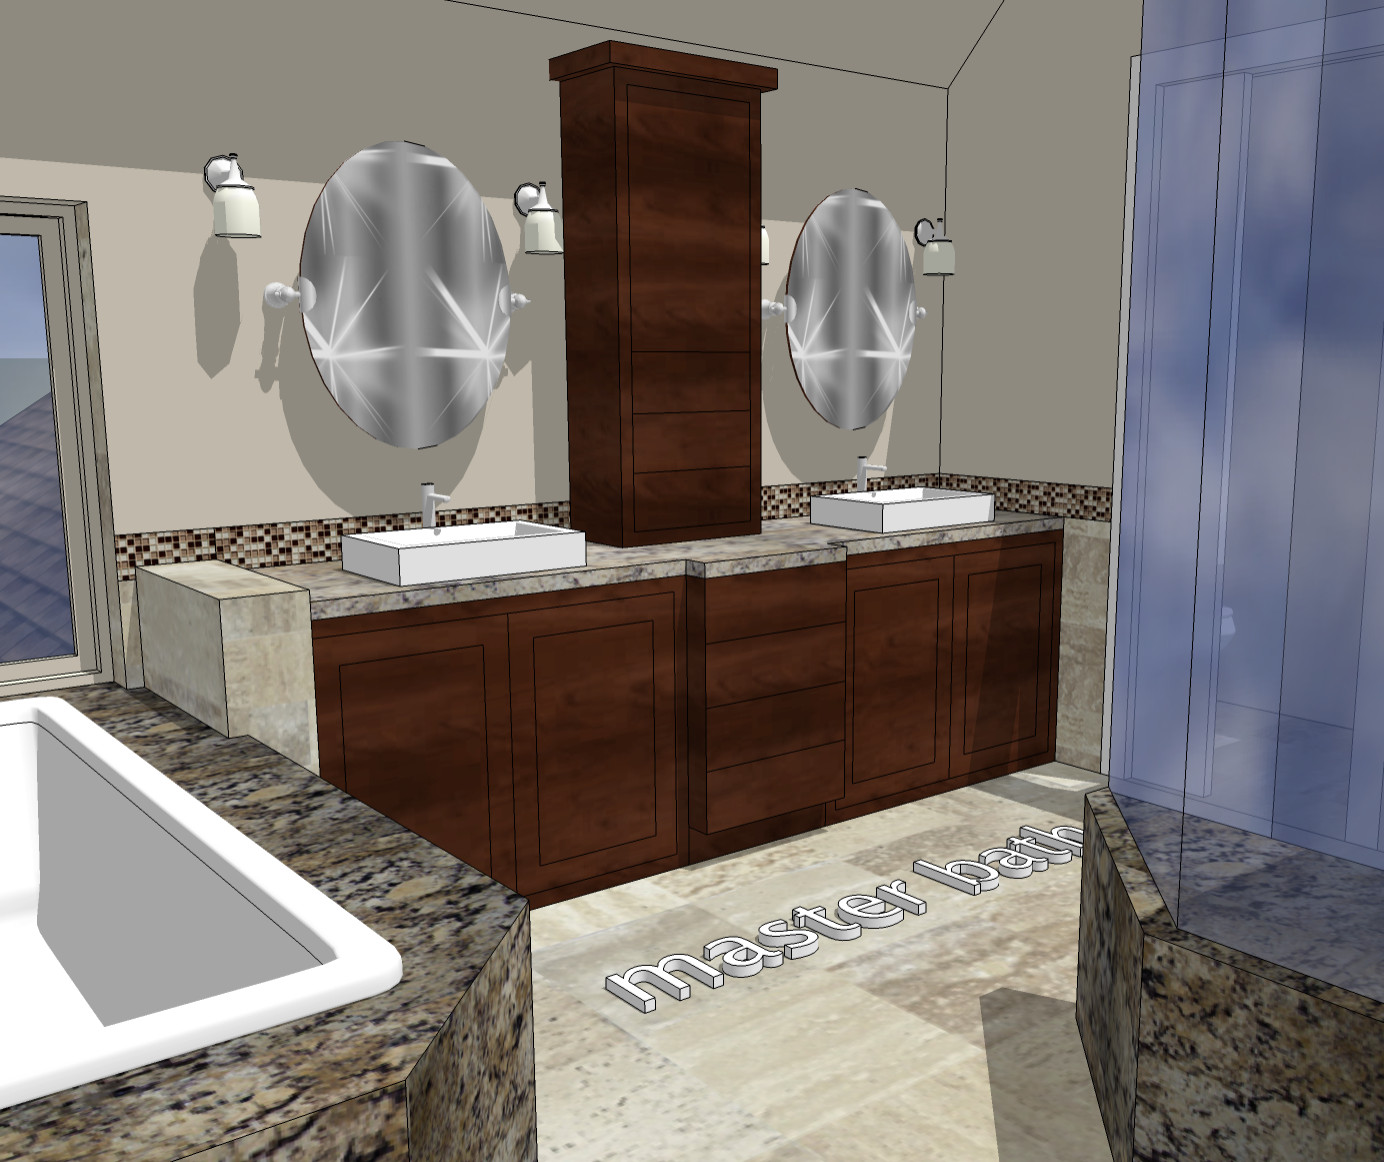 Woodbury - 3D Master Suite Remodel